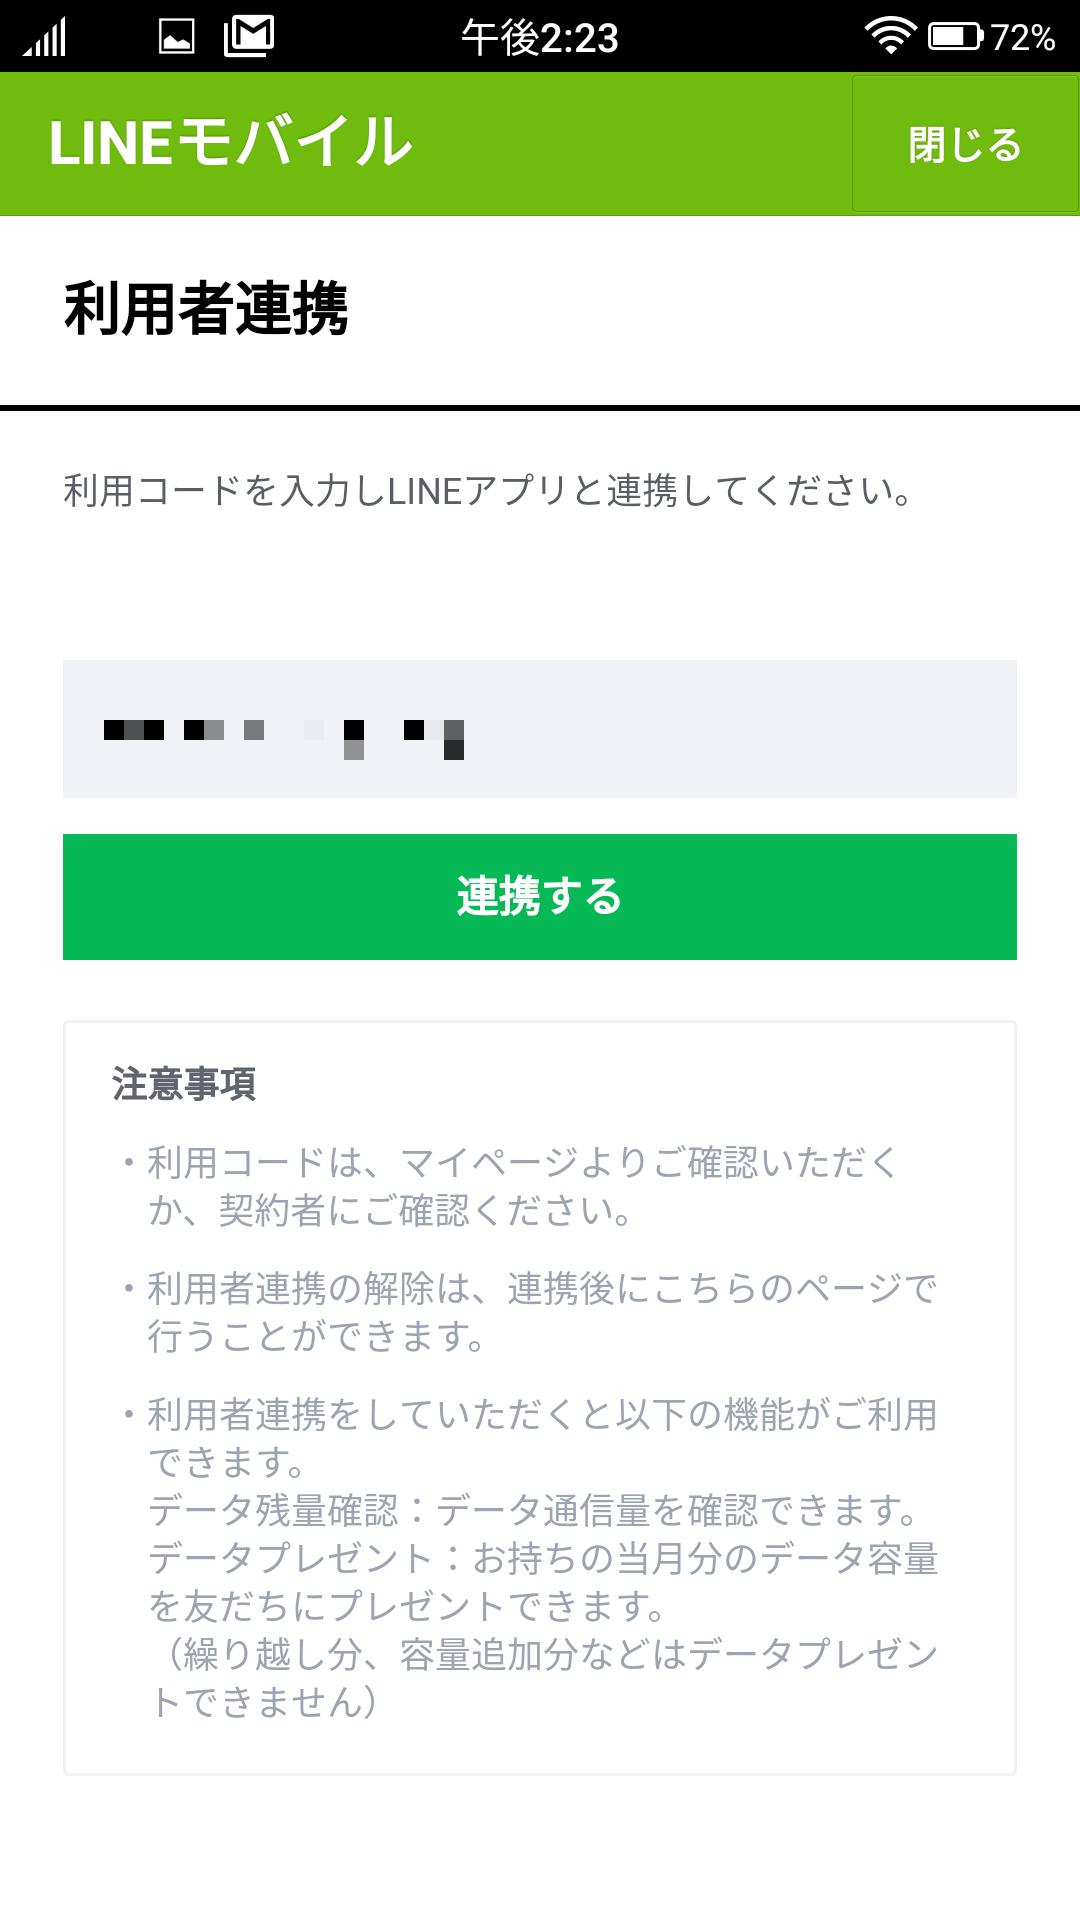 LINEモバイル:LINEアカウントで利用者連携その2